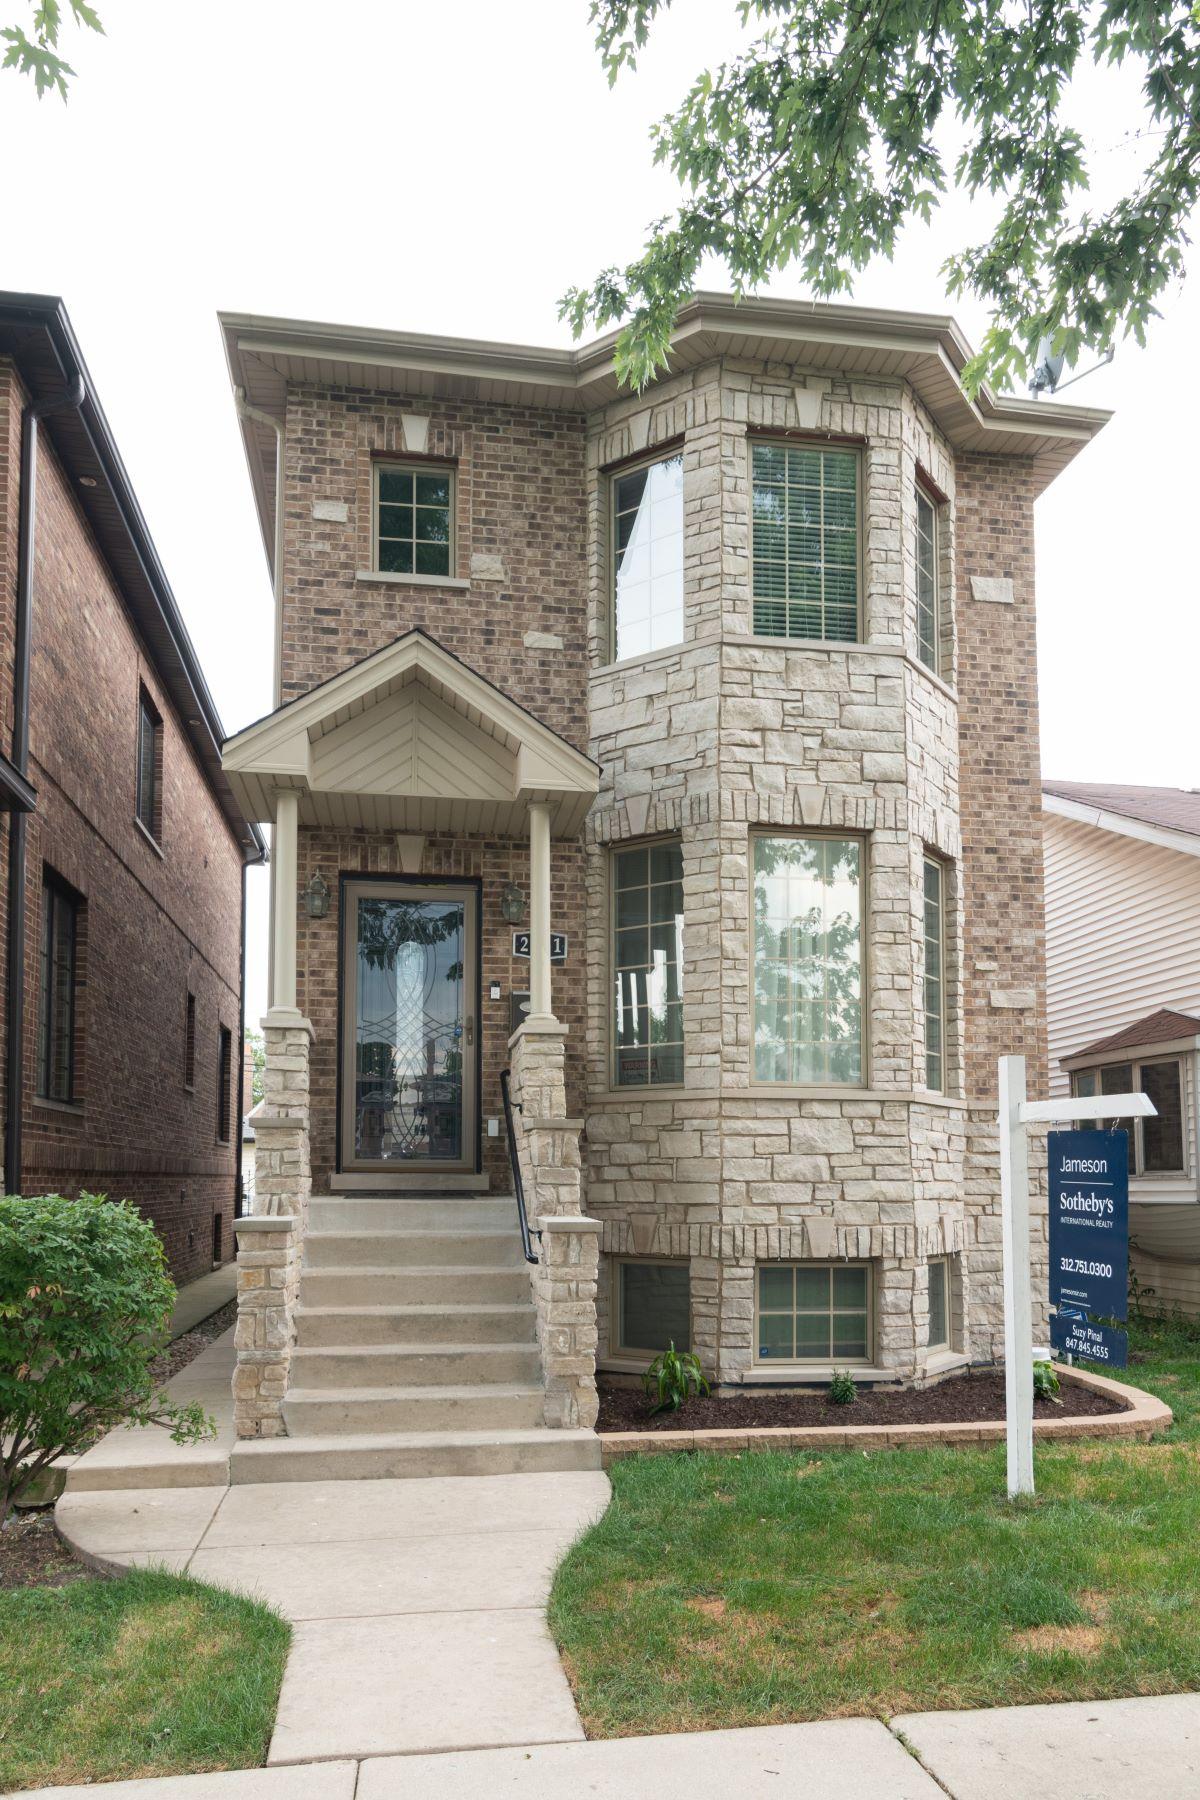 Single Family Homes for Sale at Stunning Elmwood Park Home 2831 N 73rd Avenue Elmwood Park, Illinois 60707 United States